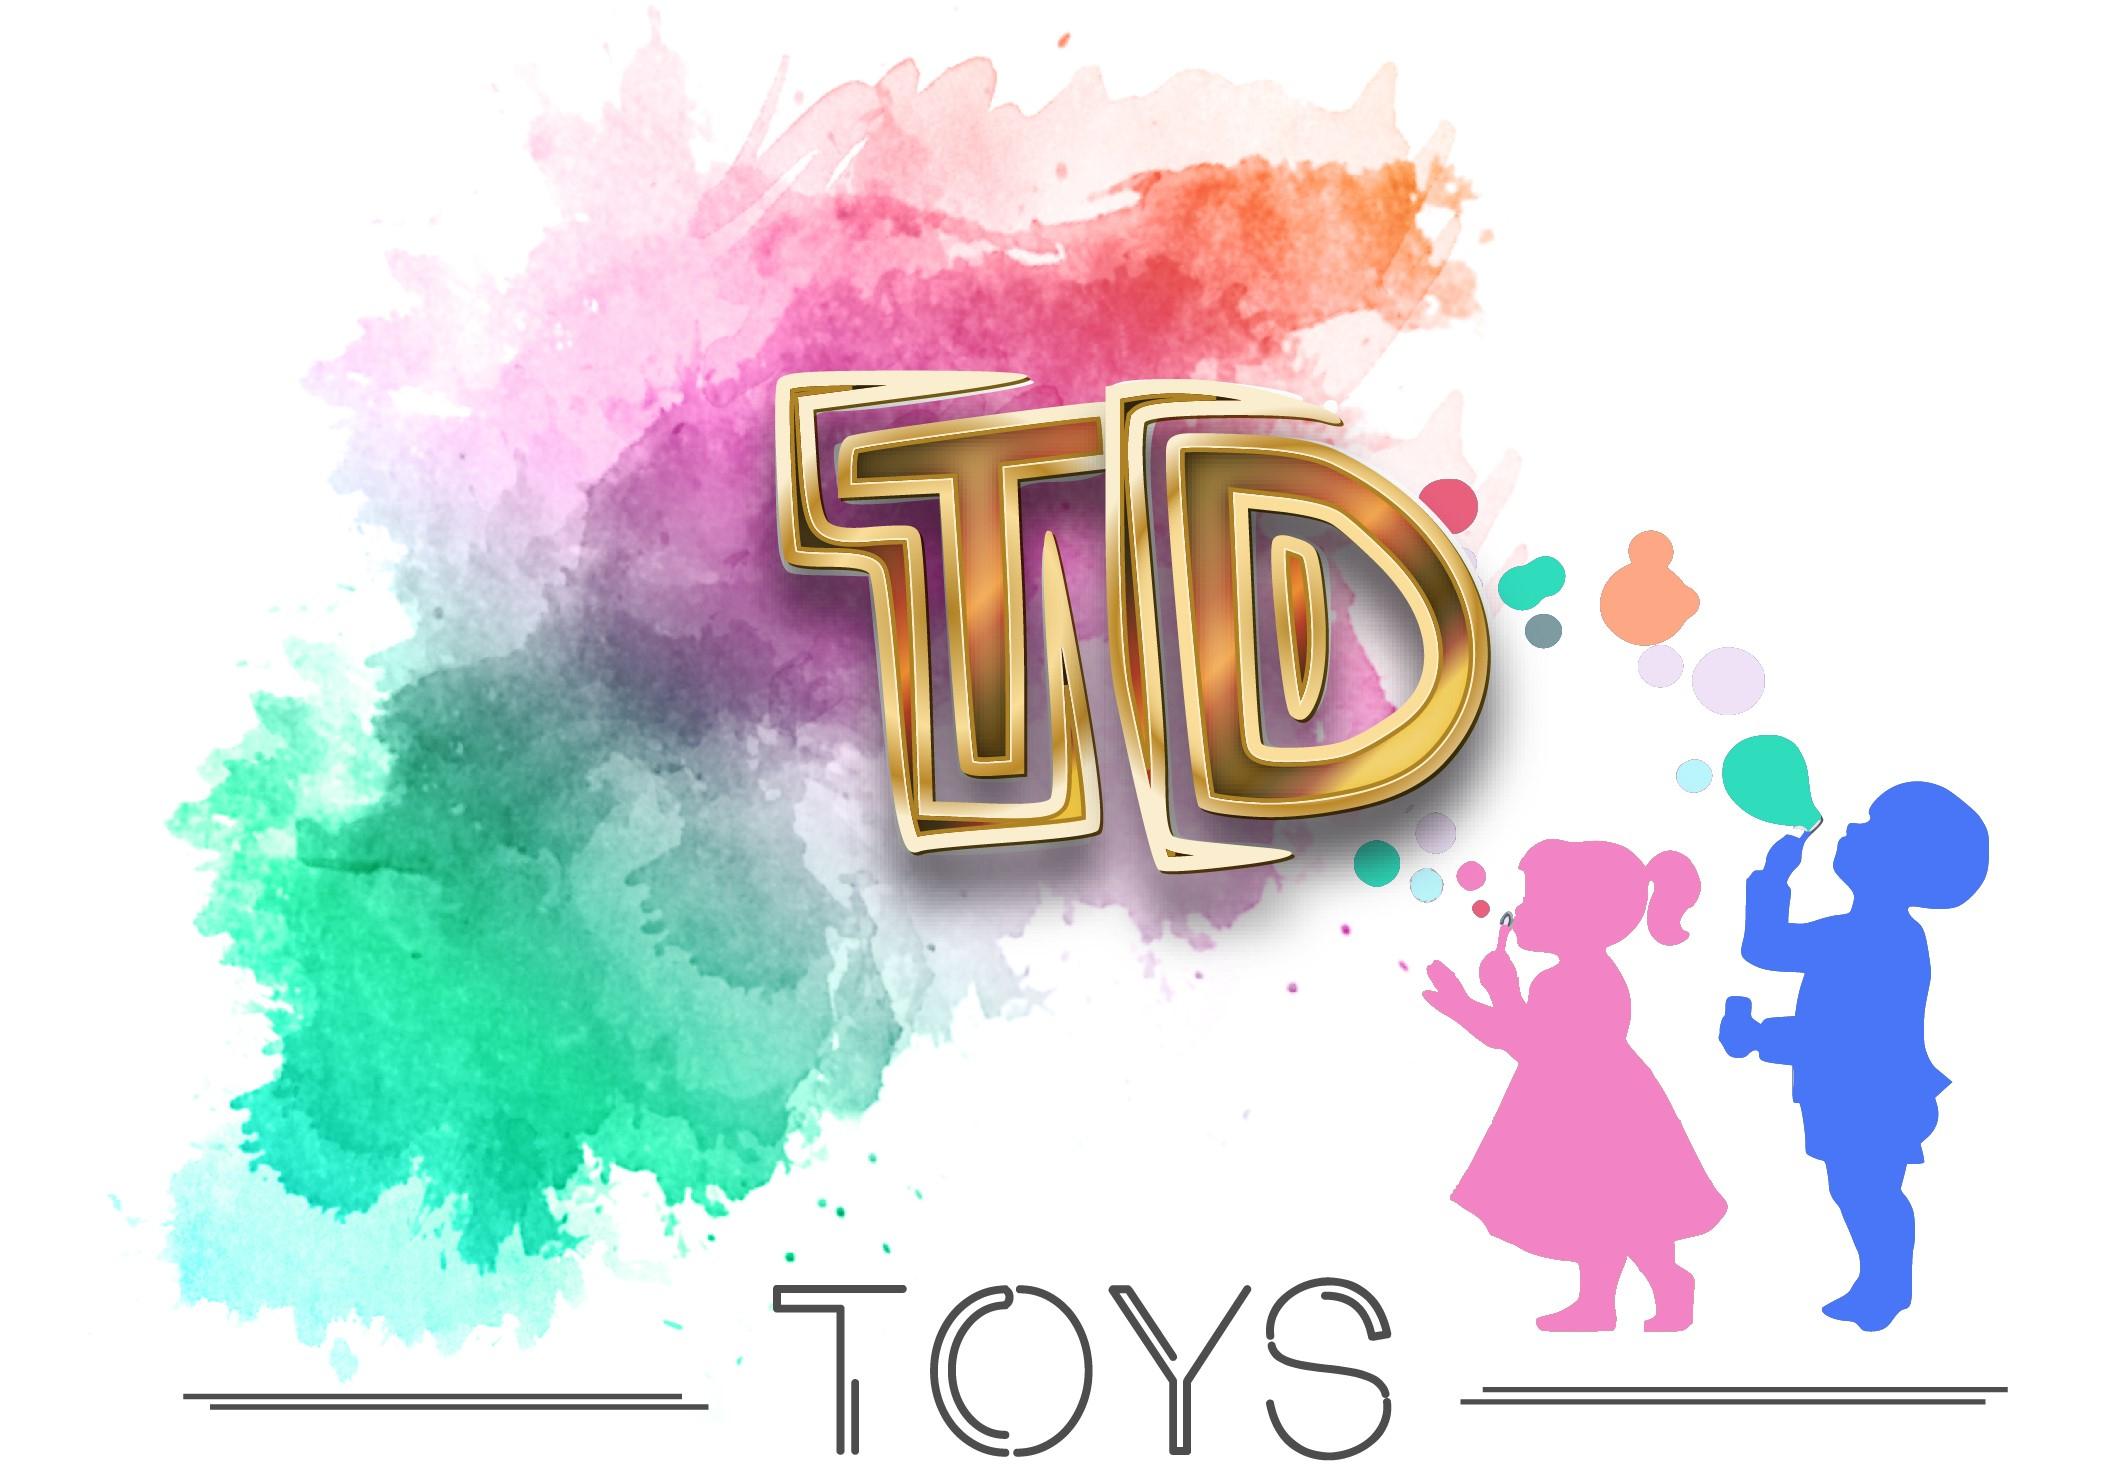 TD TOYS